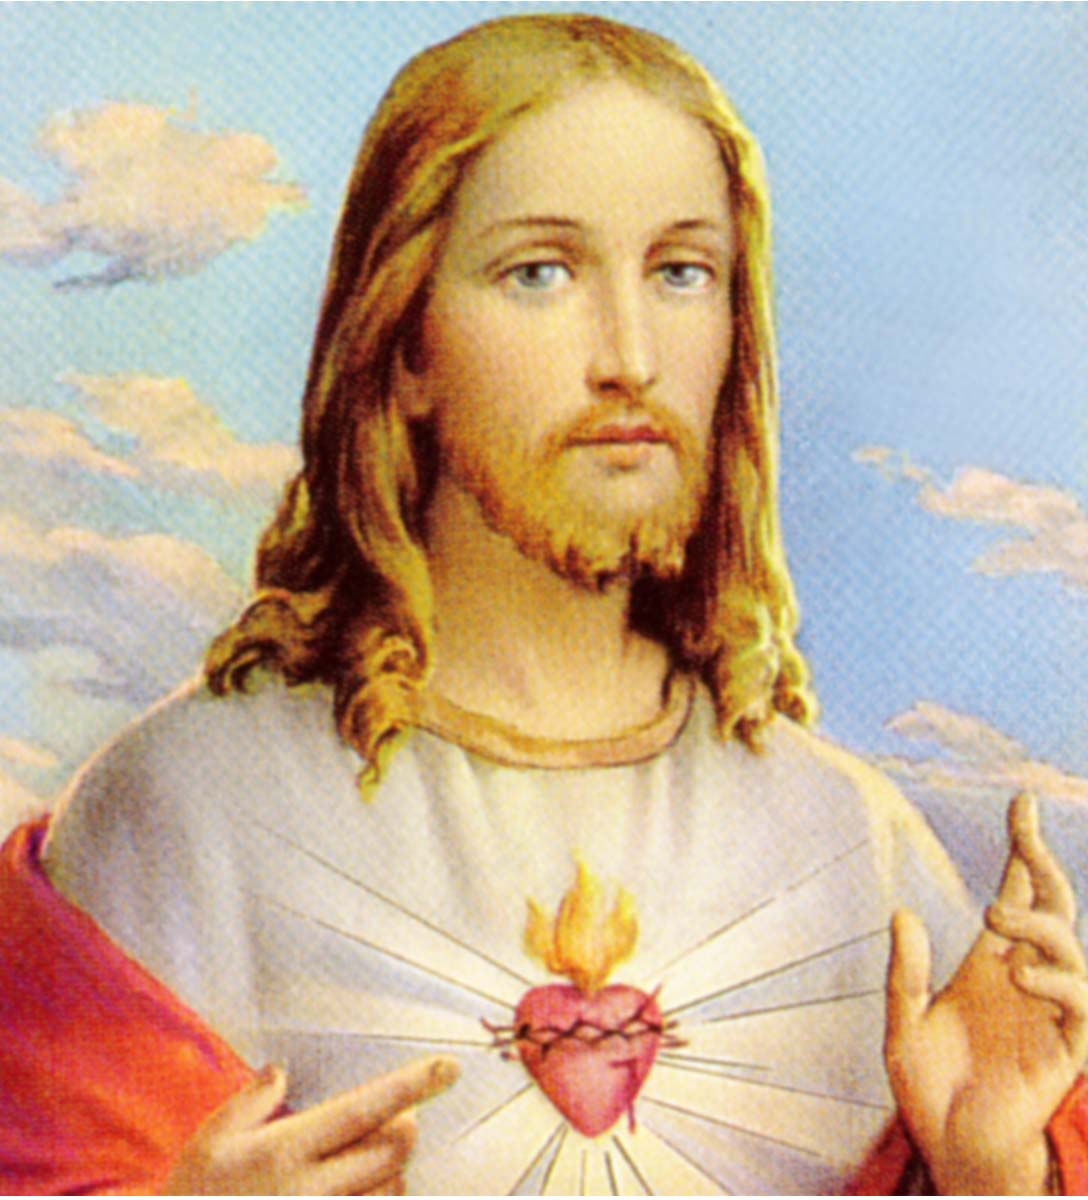 Heroes-para-ninos-Troll-face-Sweet-Jesus-Face- - PNG Jesus Face